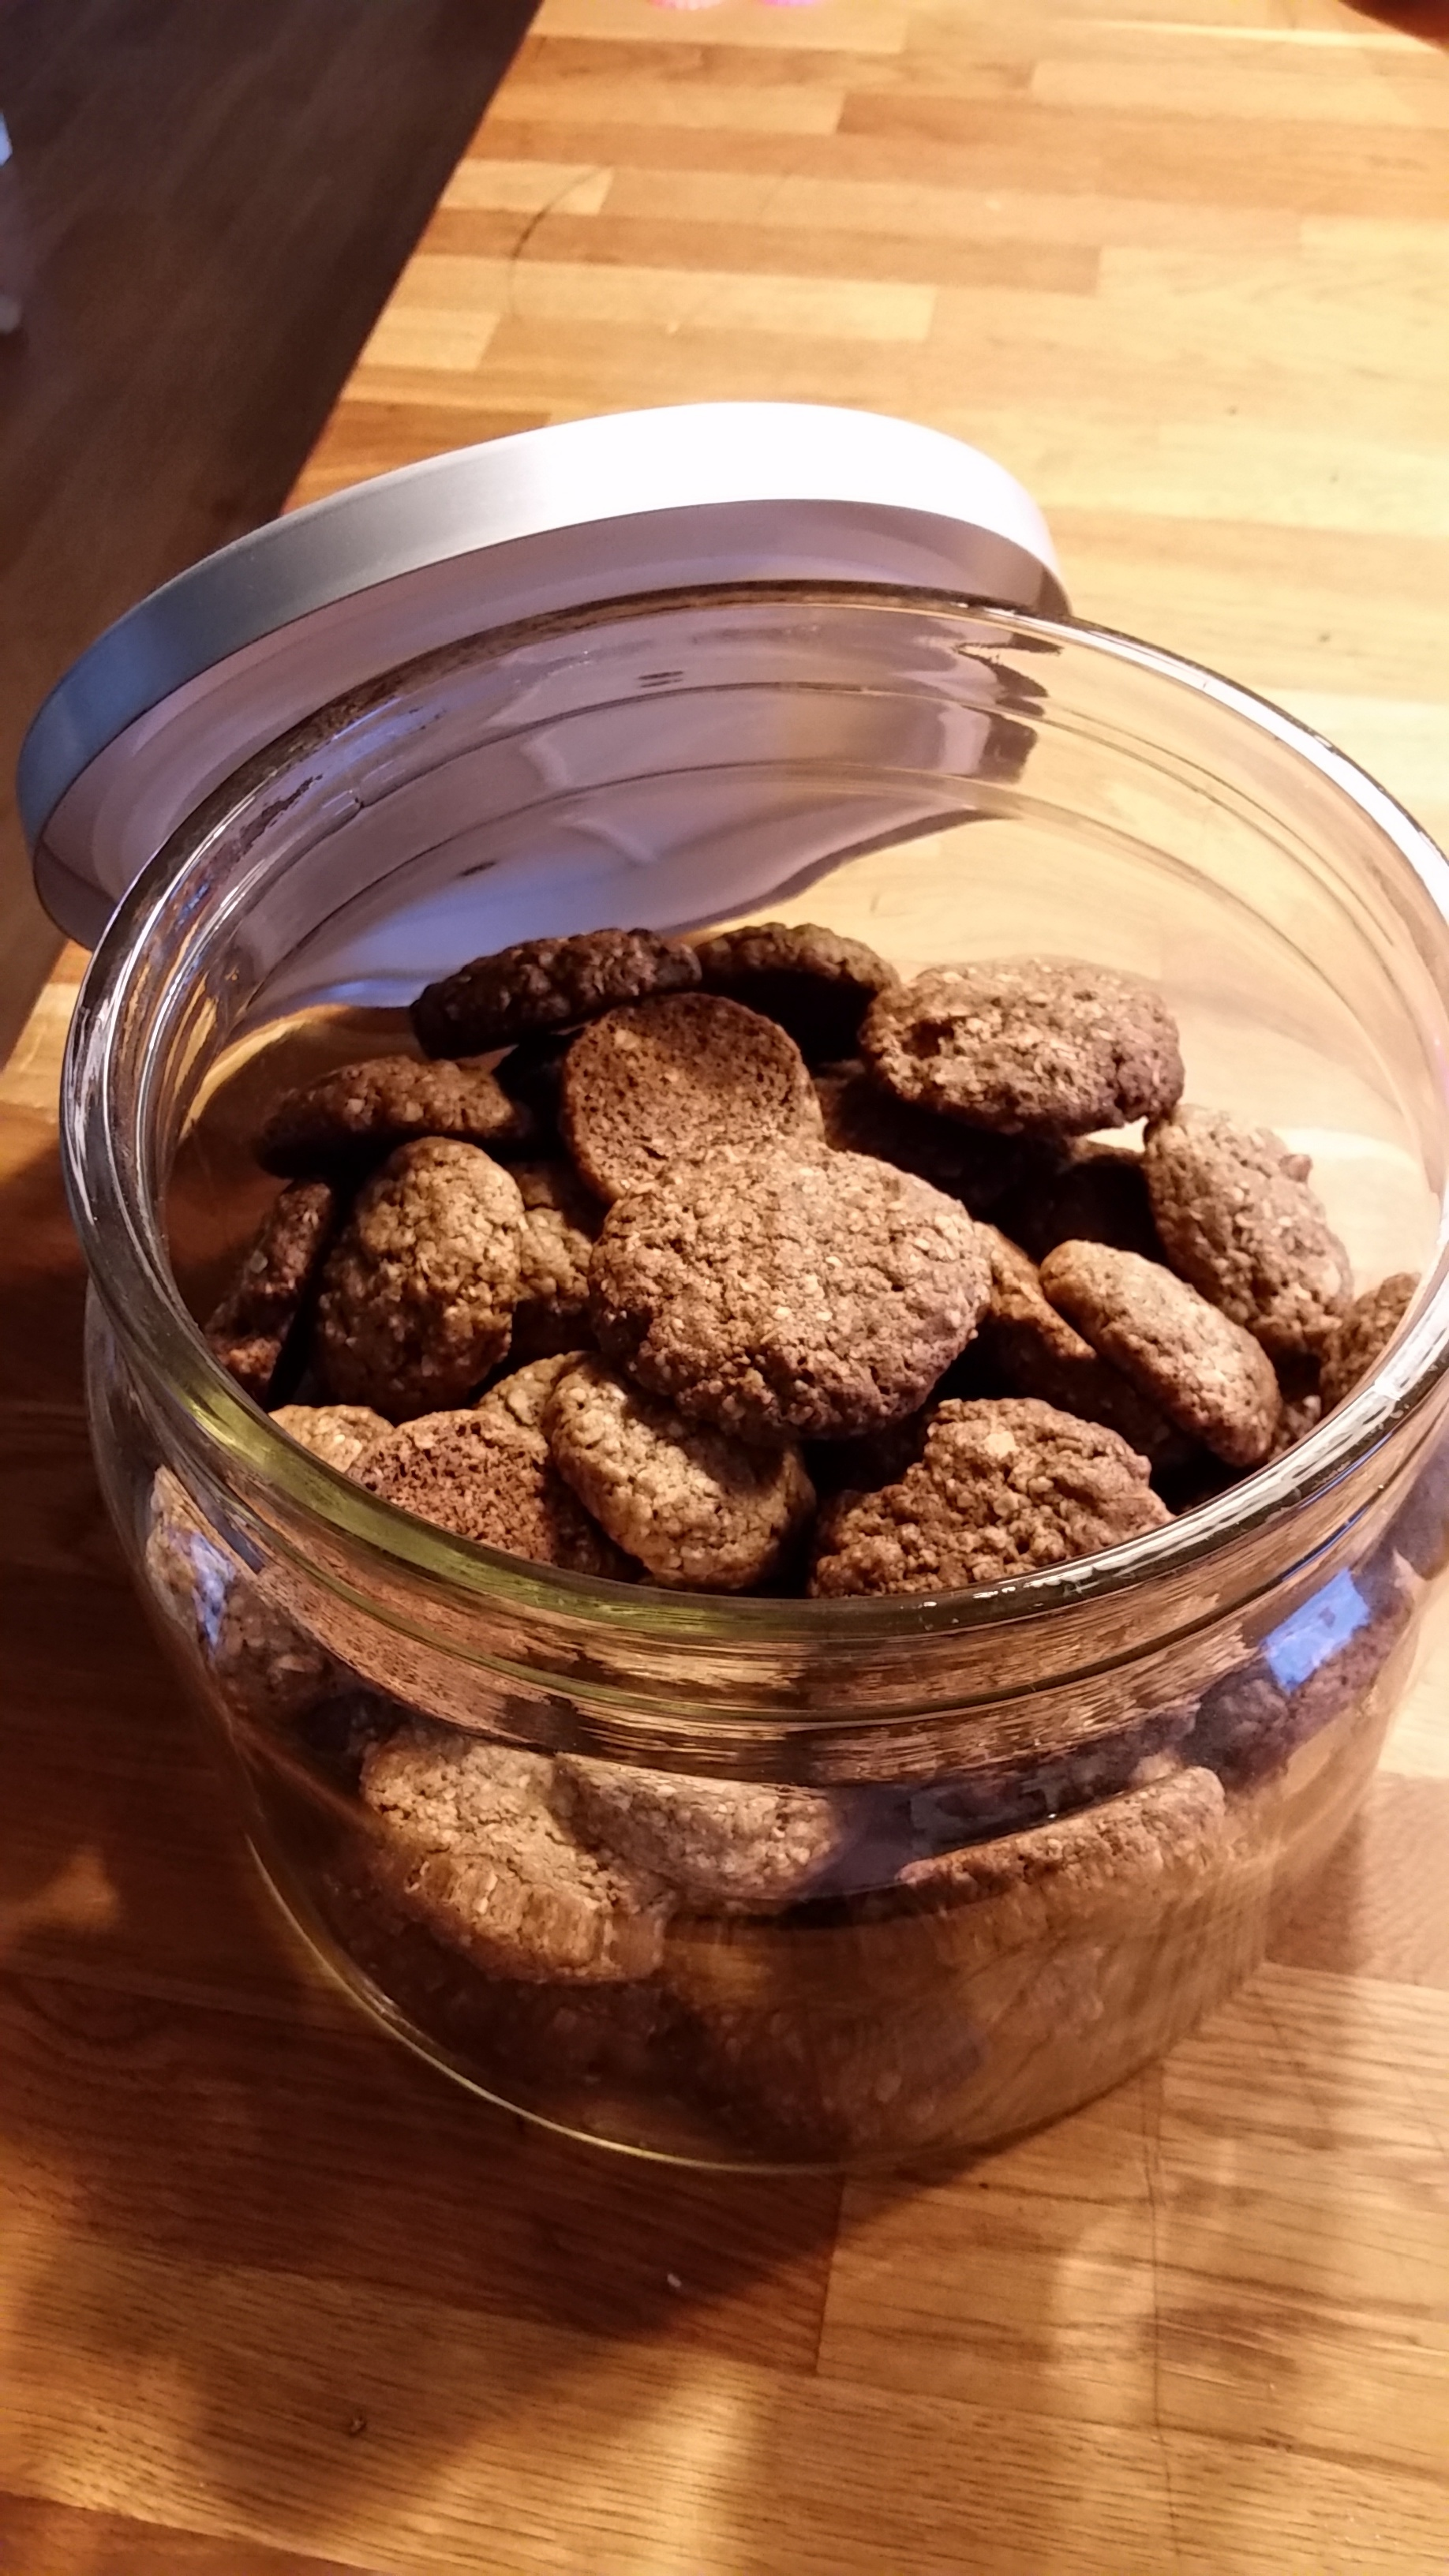 Kakmix för cookies